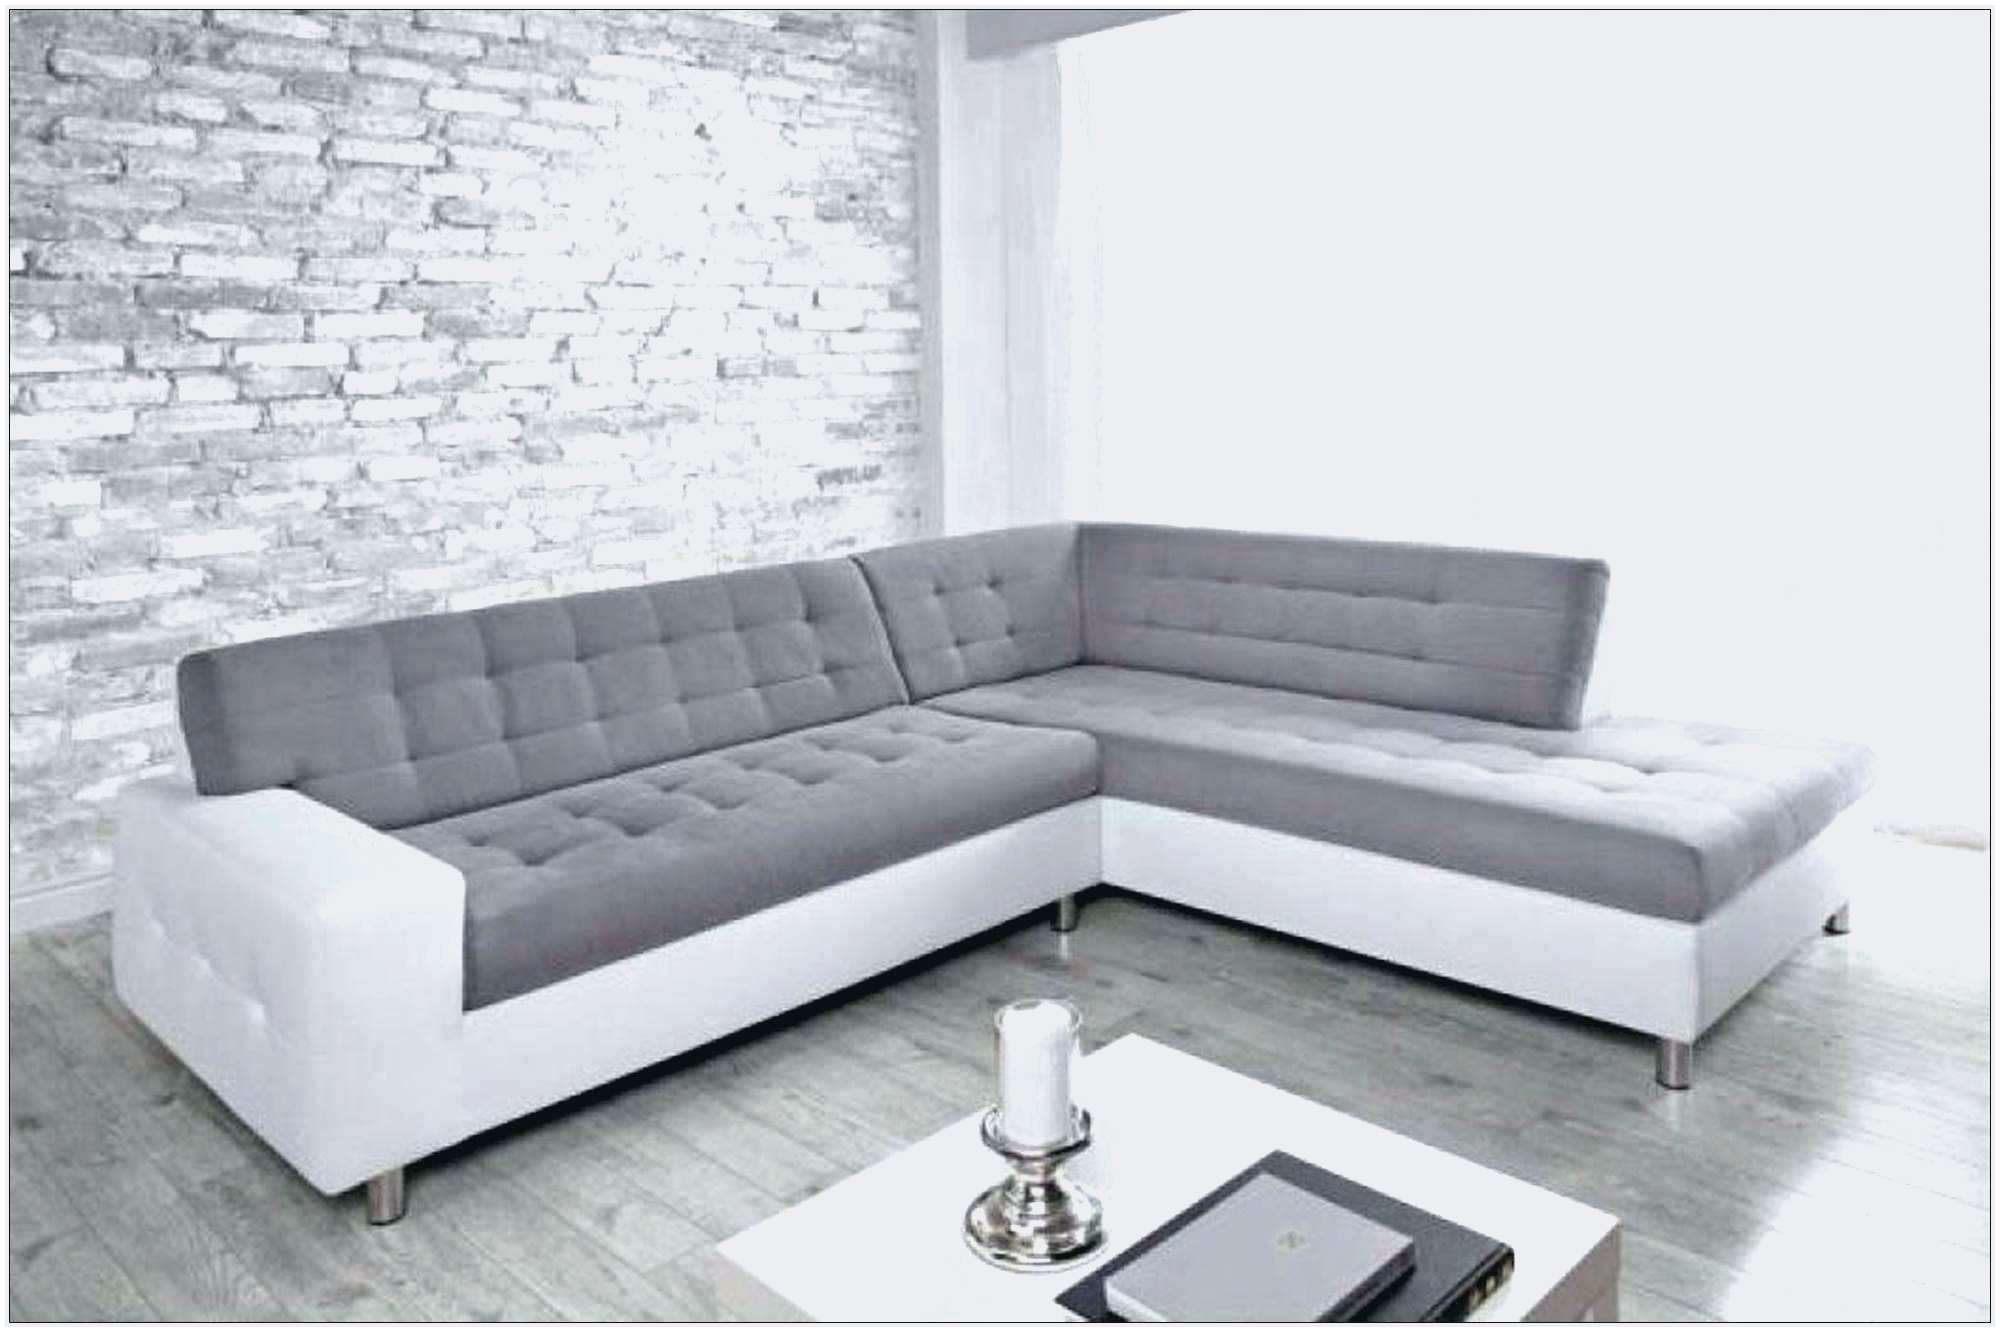 Ikea Canapé Blanc Convertible D Luxe Angle Lit Beau Joli